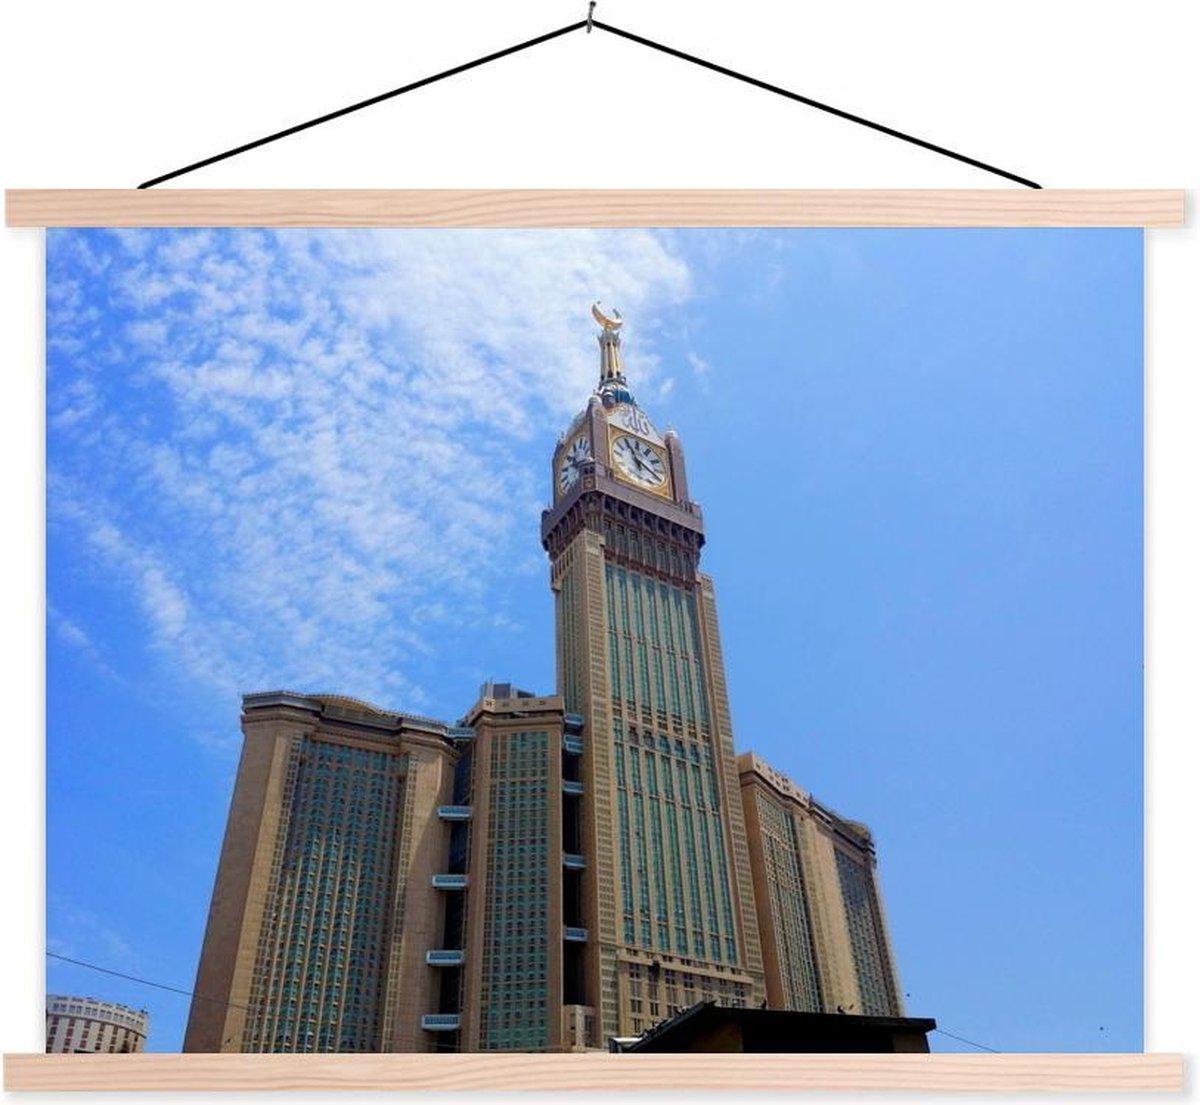 Kloktoren in Mekka textielposter latten blank 40x30 cm - klein - Foto print op schoolplaat (wanddecoratie woonkamer/slaapkamer)